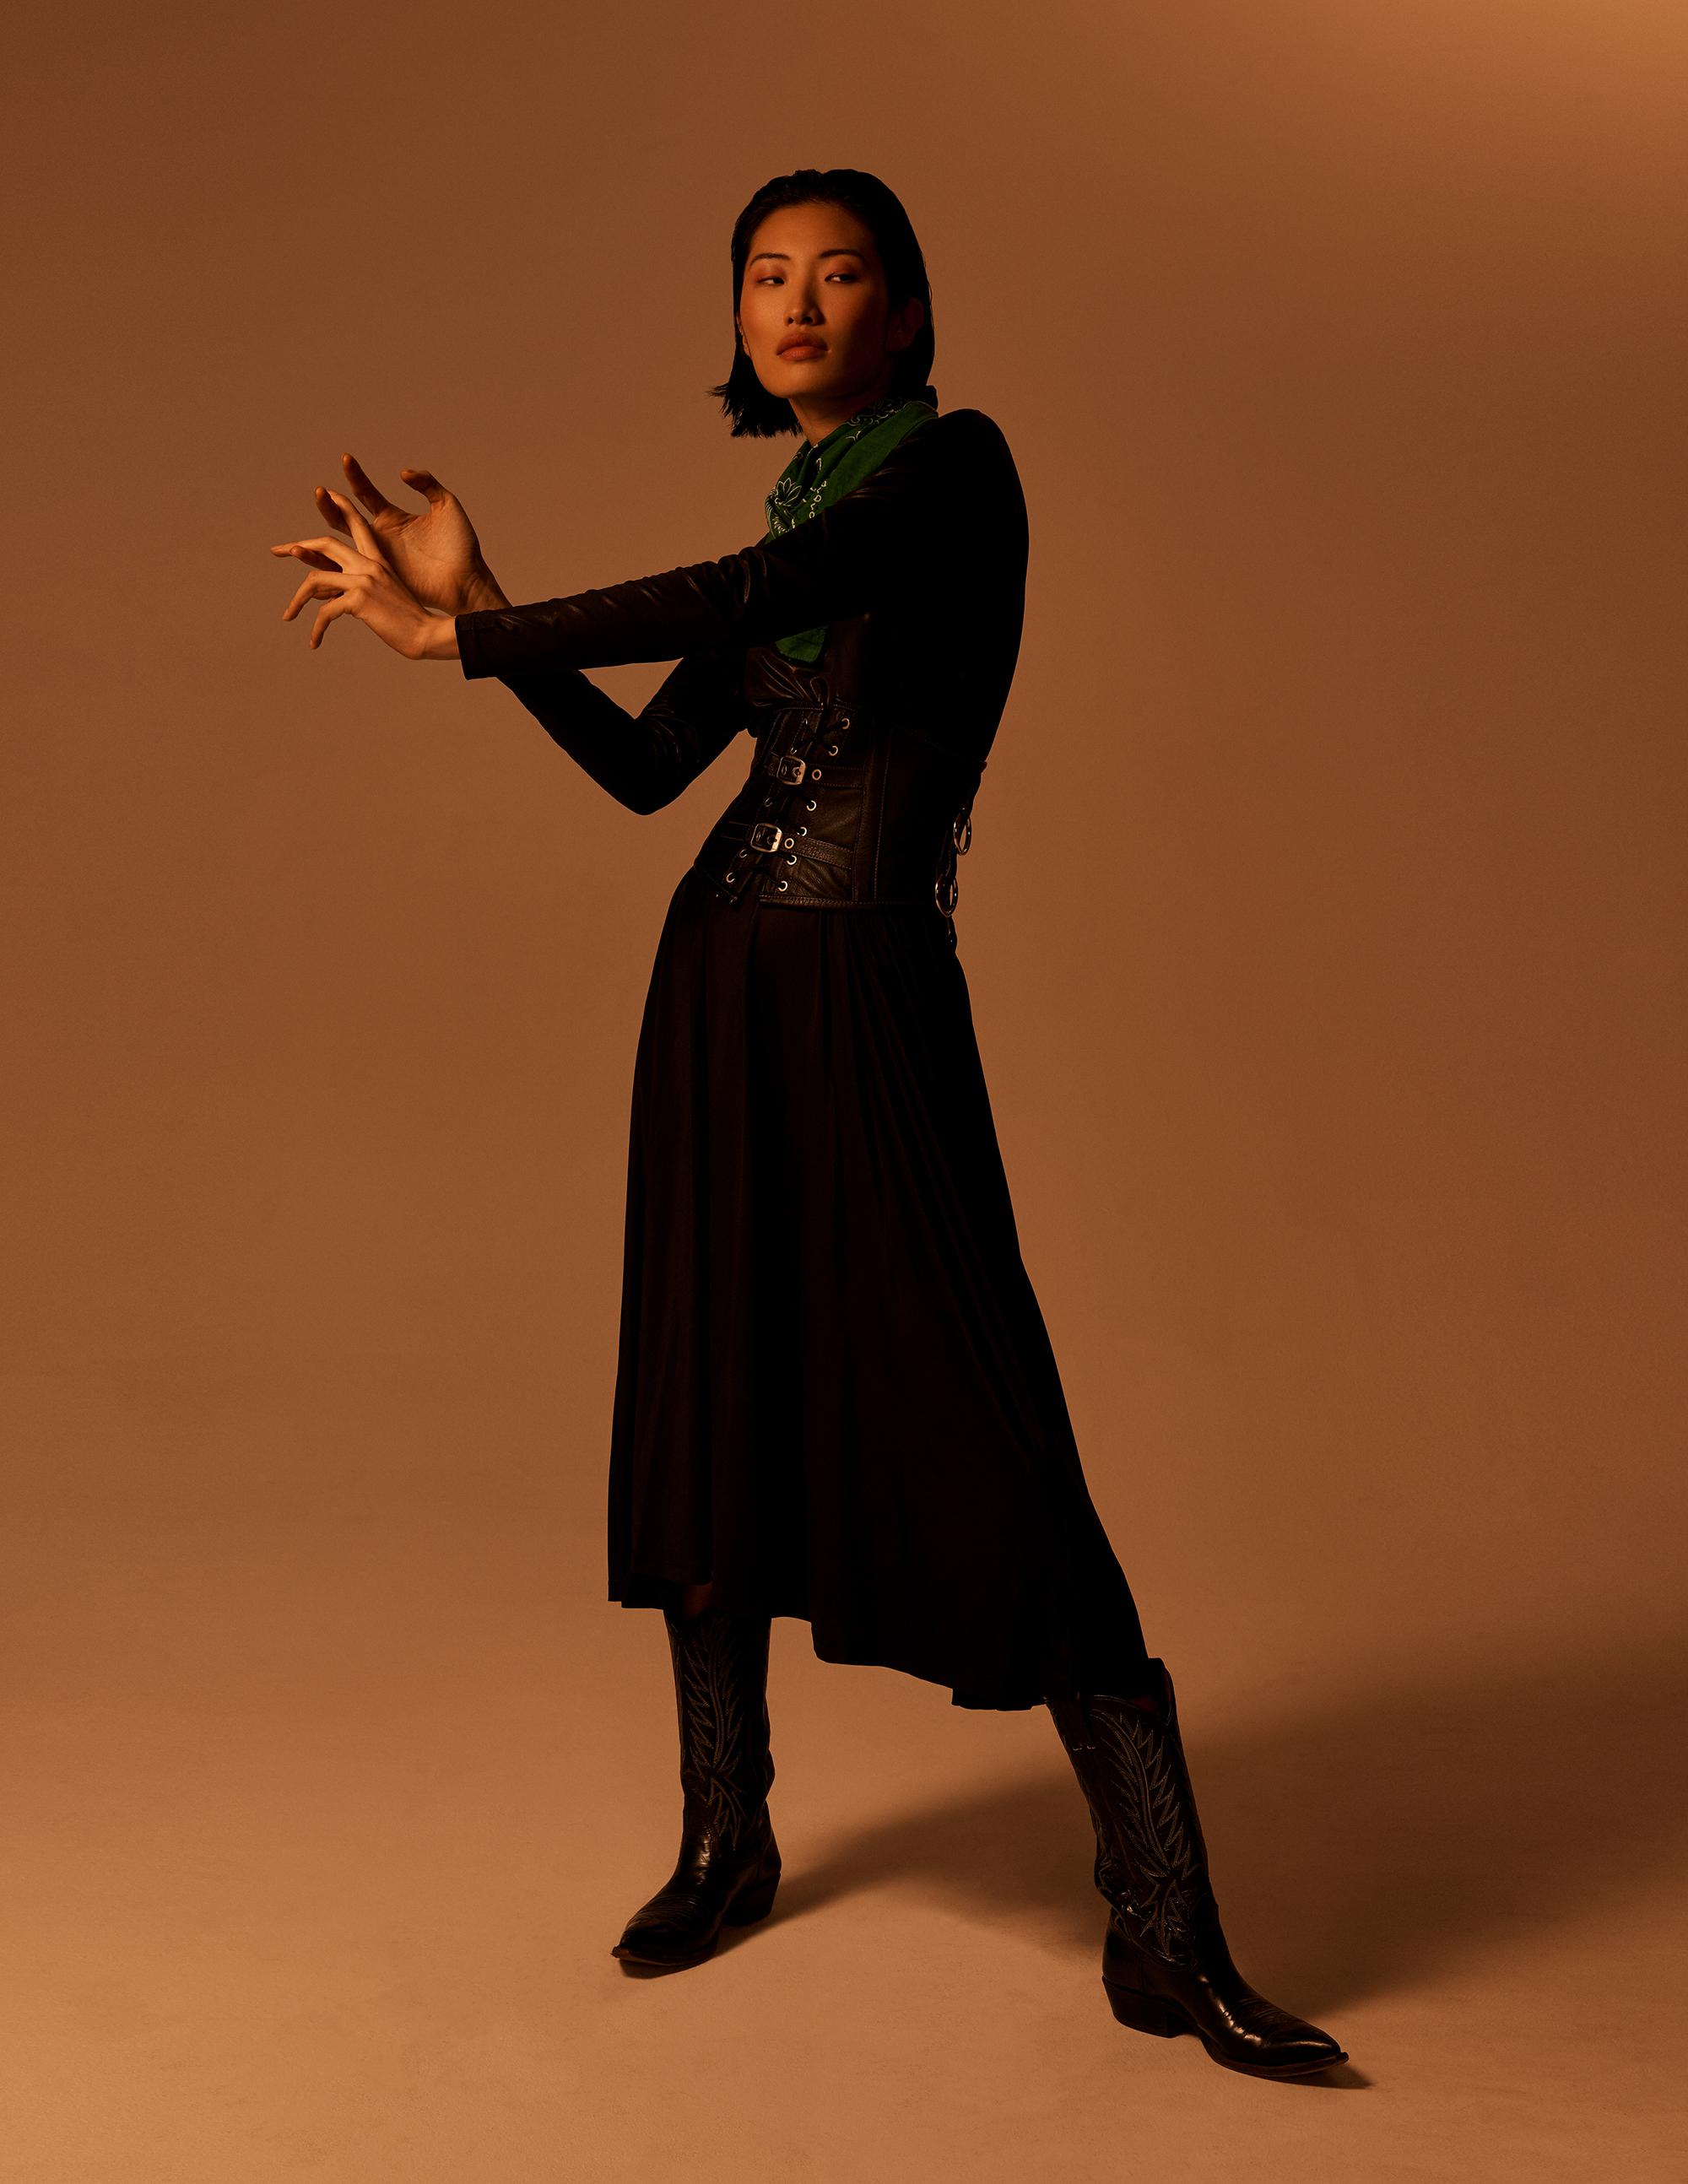 Dress  MM6 . Leather corset belt  Hustler . Bandana Vintage. Boots  Nocona c/o Farnaz Dadash i. Chains  Mara Peralta